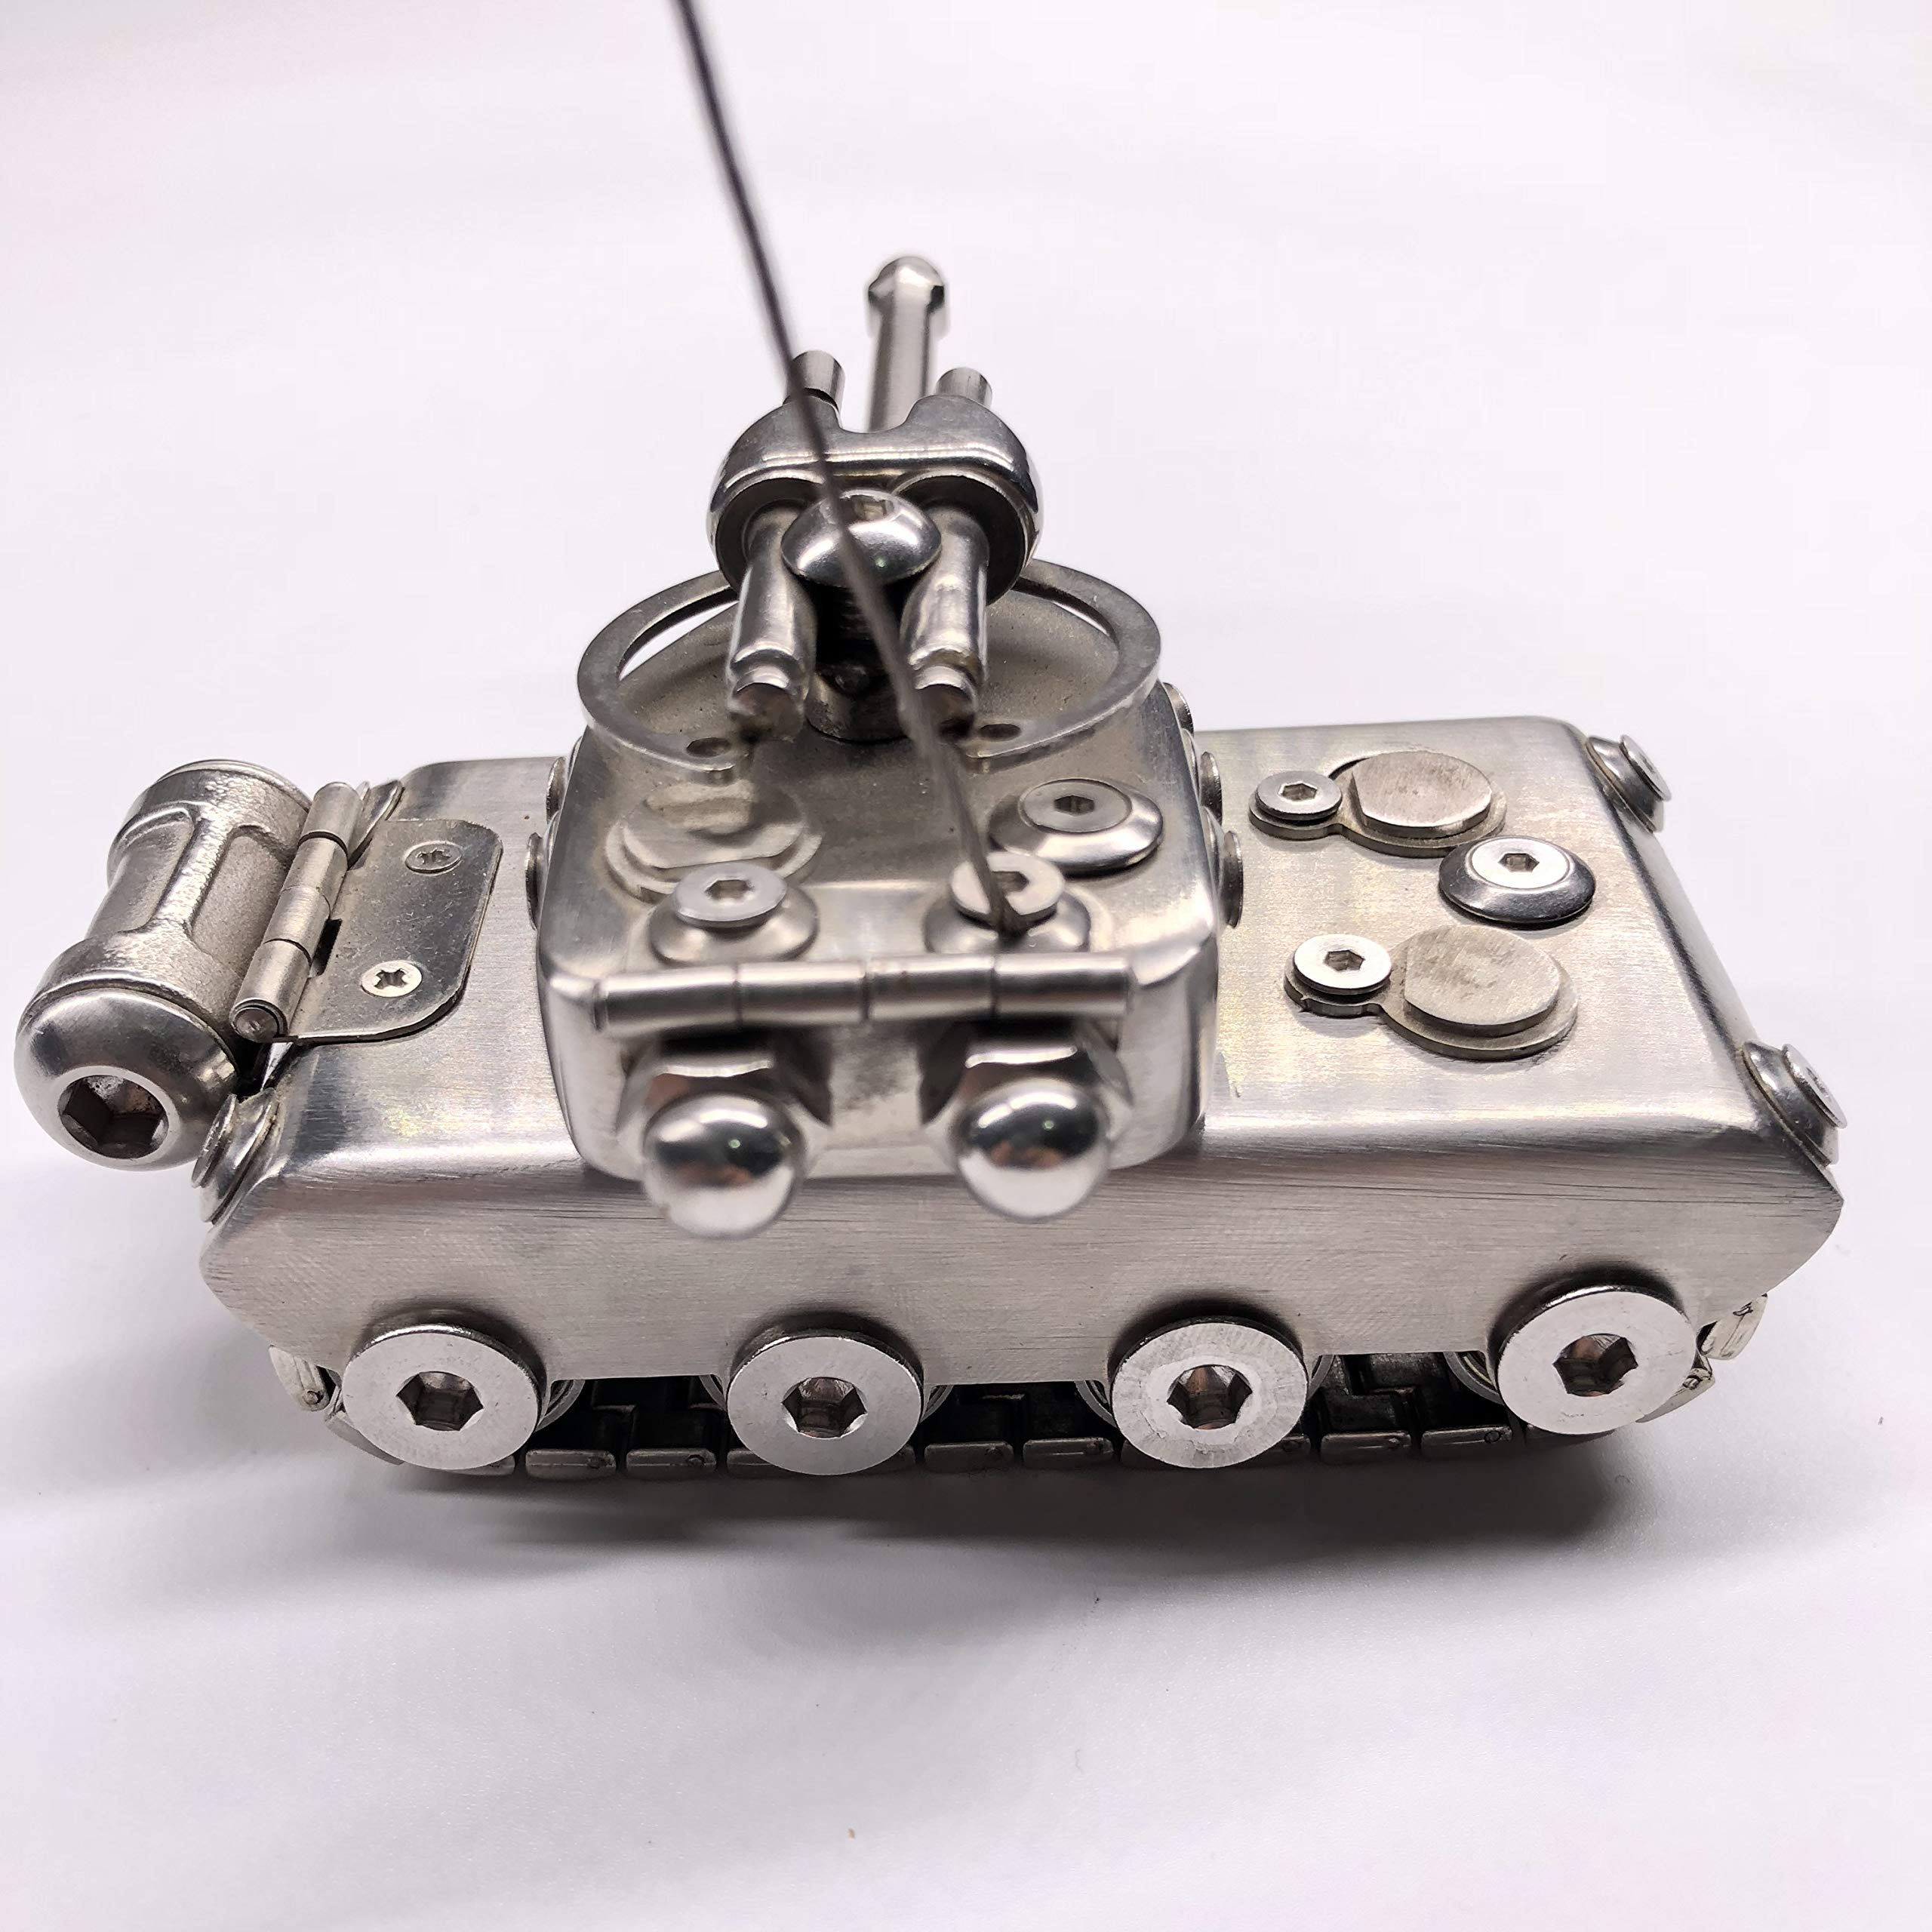 alasa Handmade Metal Tank Model Military Fans Must Collect by alasa (Image #6)